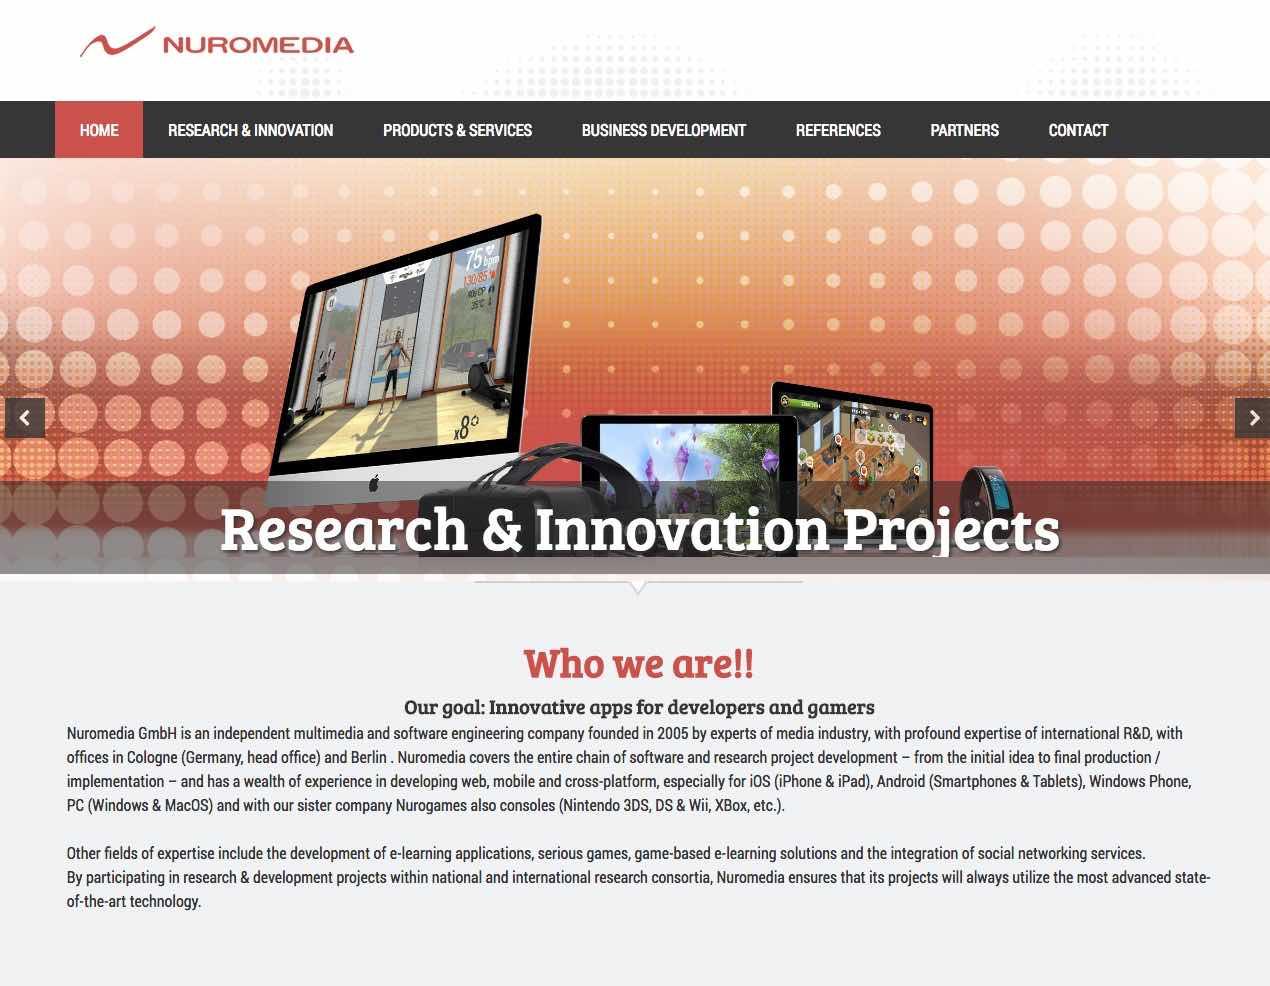 Nuromedia-Project